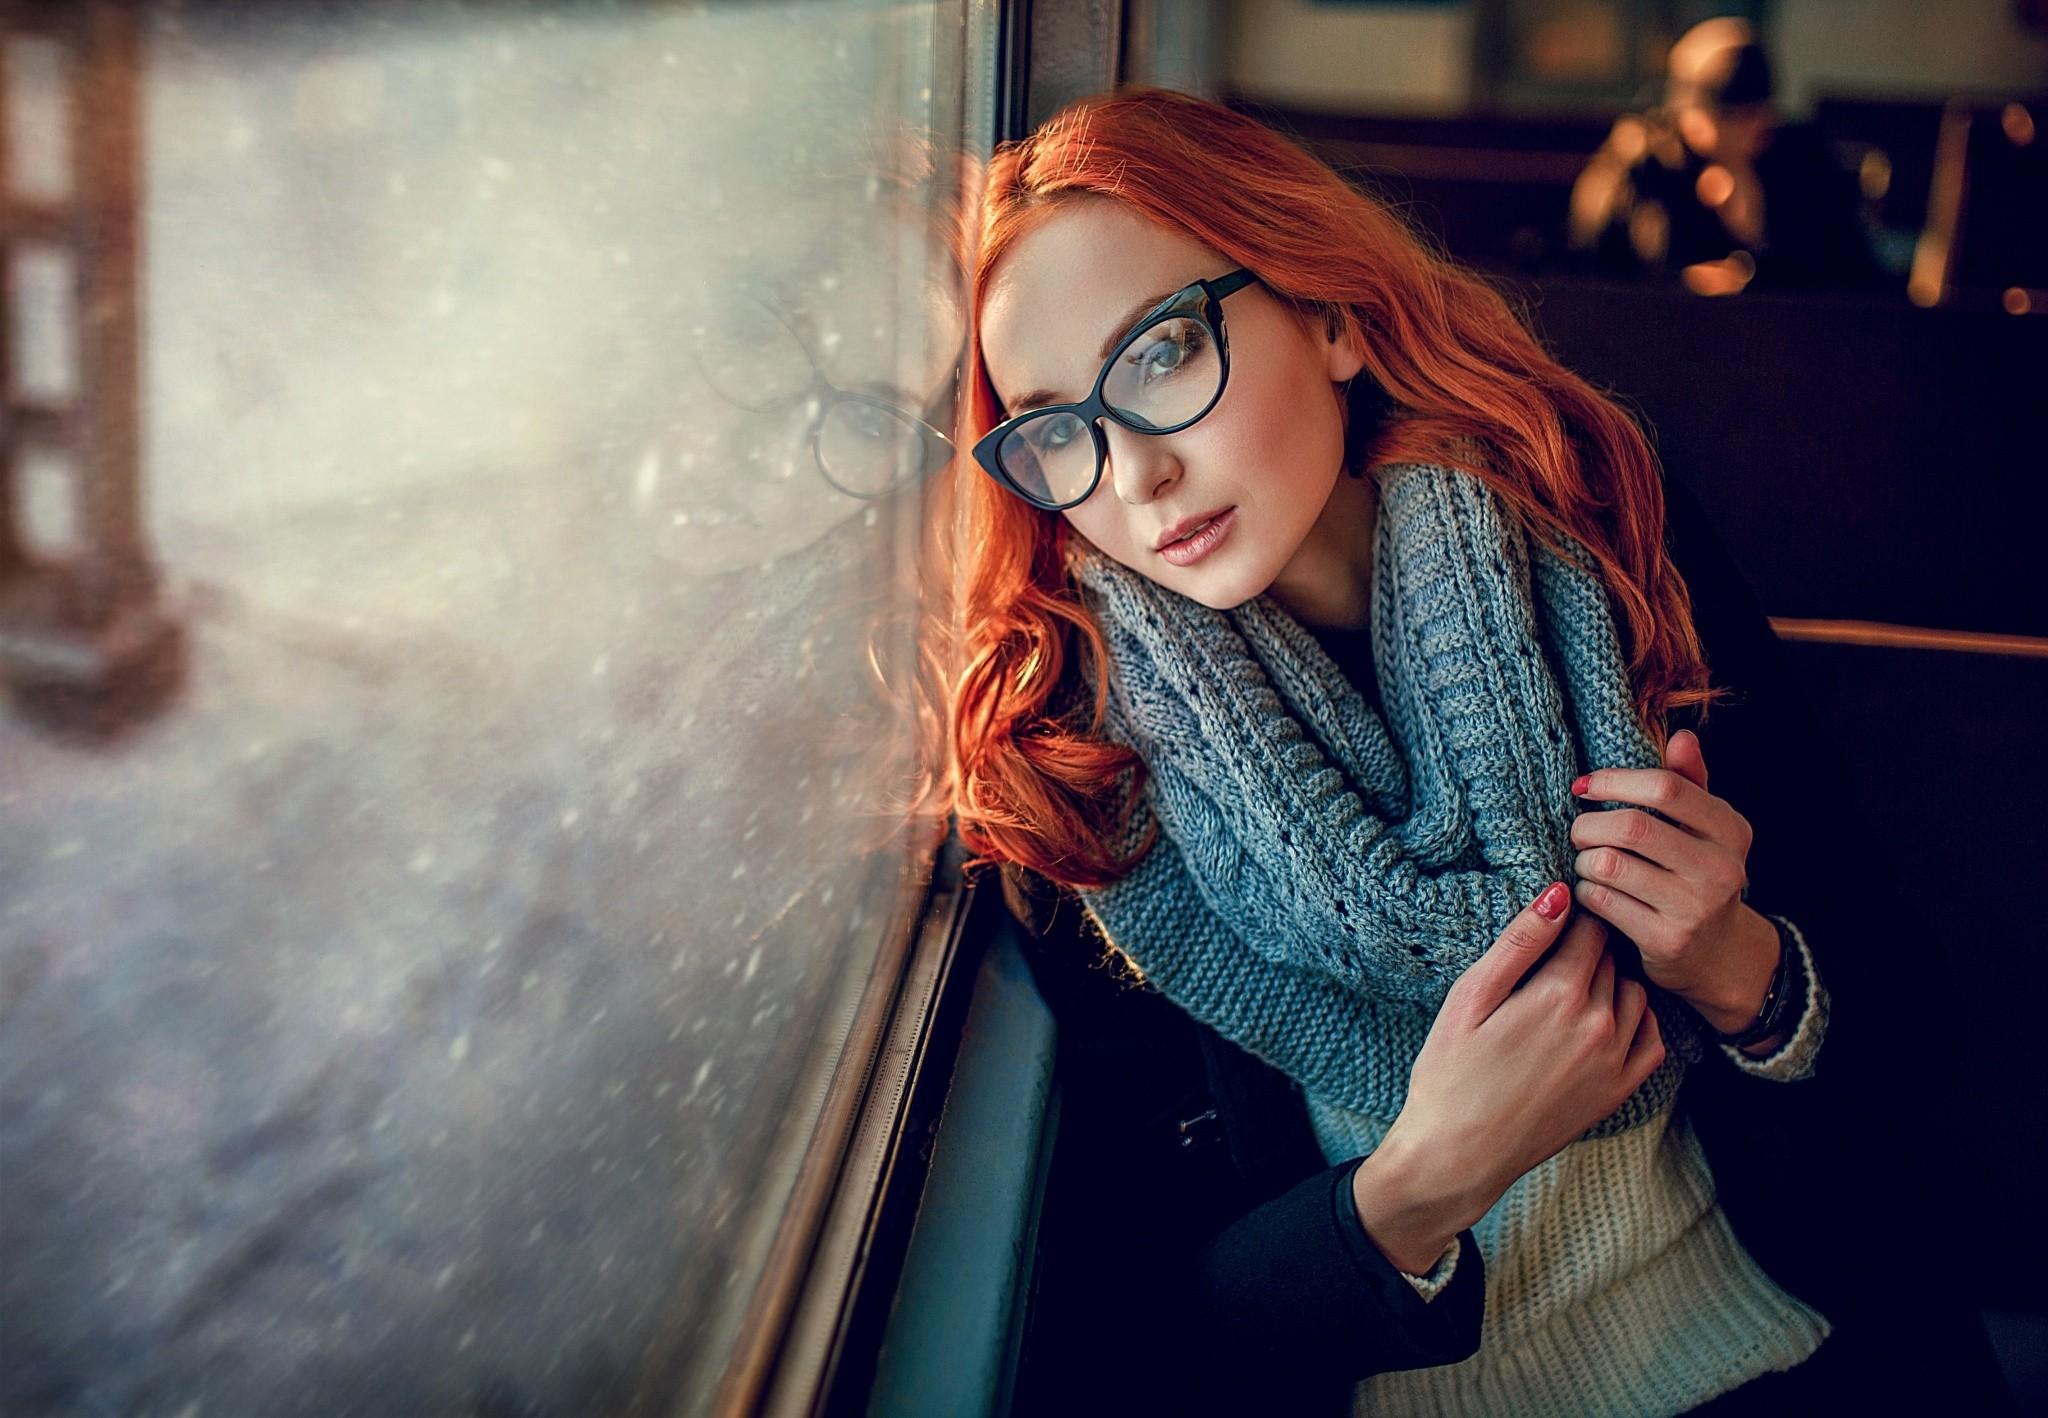 redhead-glasses